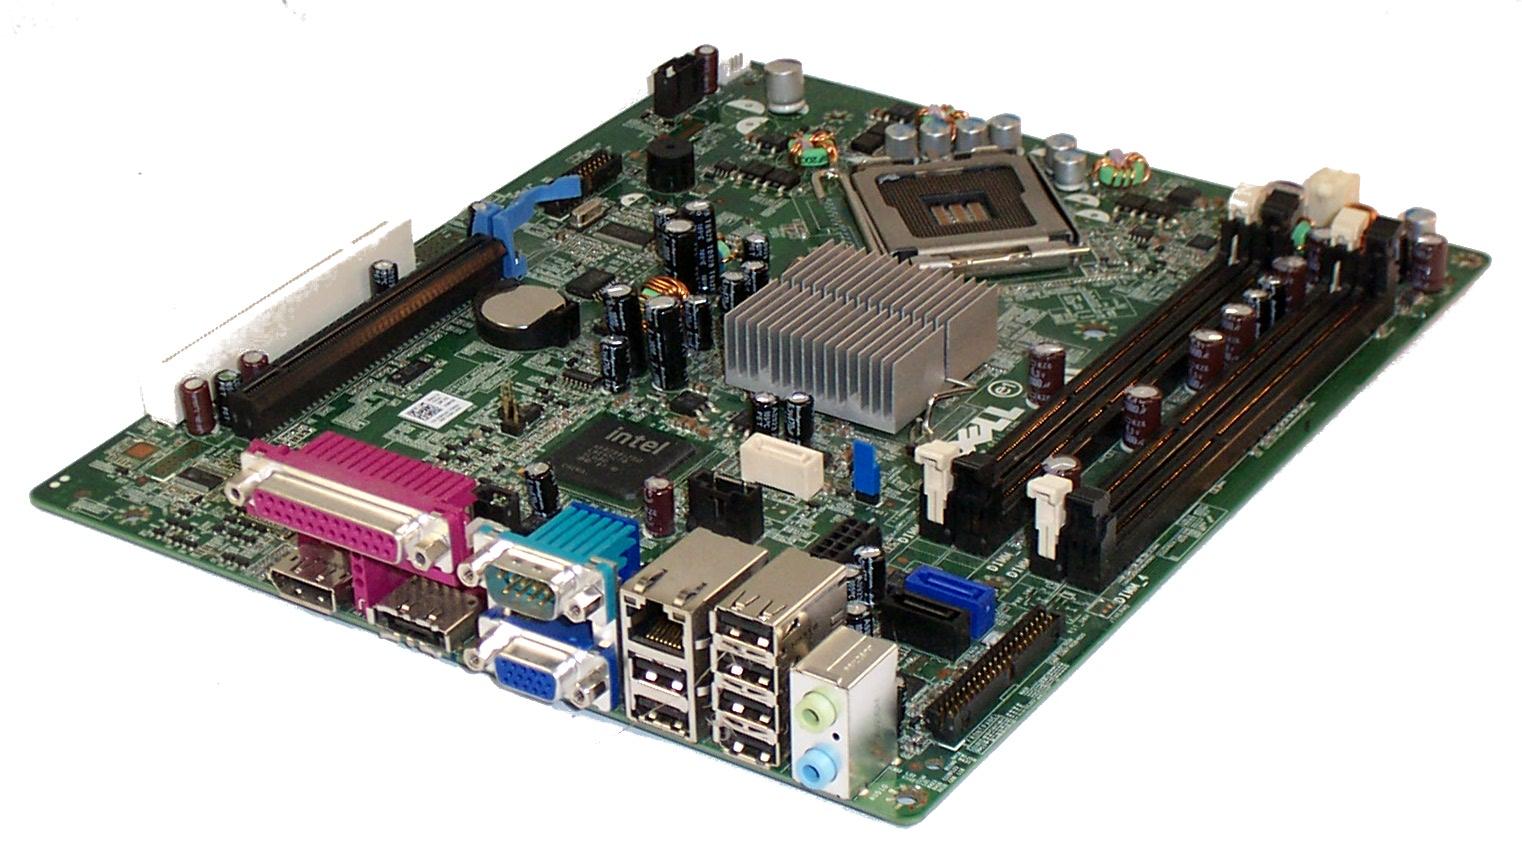 Dell 3NVJ6 OptiPlex 780 SFF (Model:DCCY1F) LGA775 Motherboard